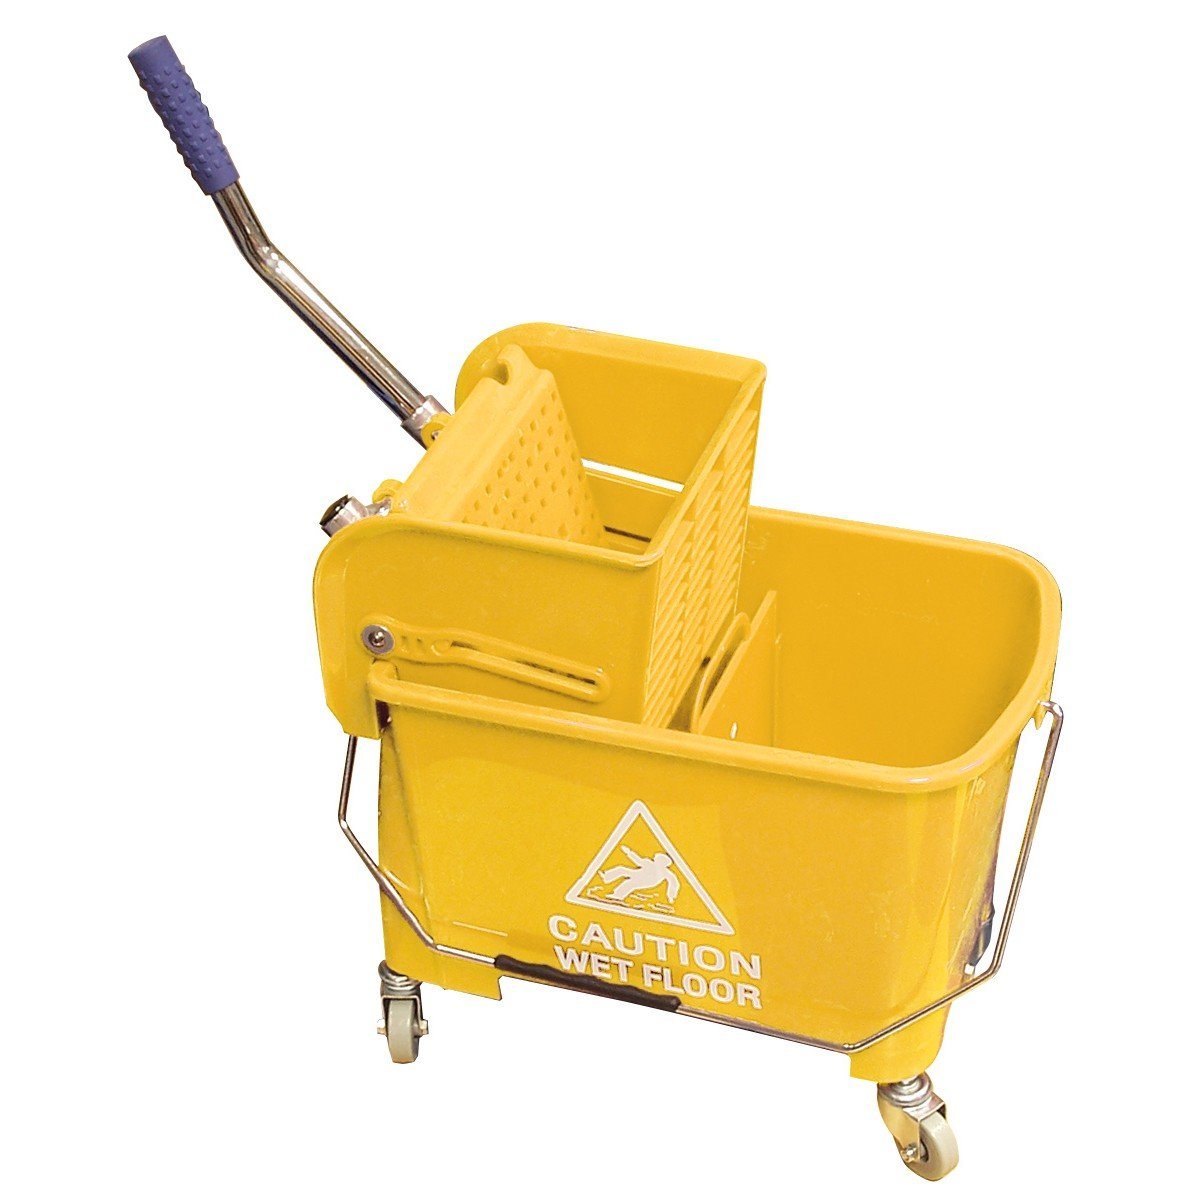 SIDEPRESS Wringer Bucket Combo - 5 GAL (21 L) - Yellow Johnny Vac